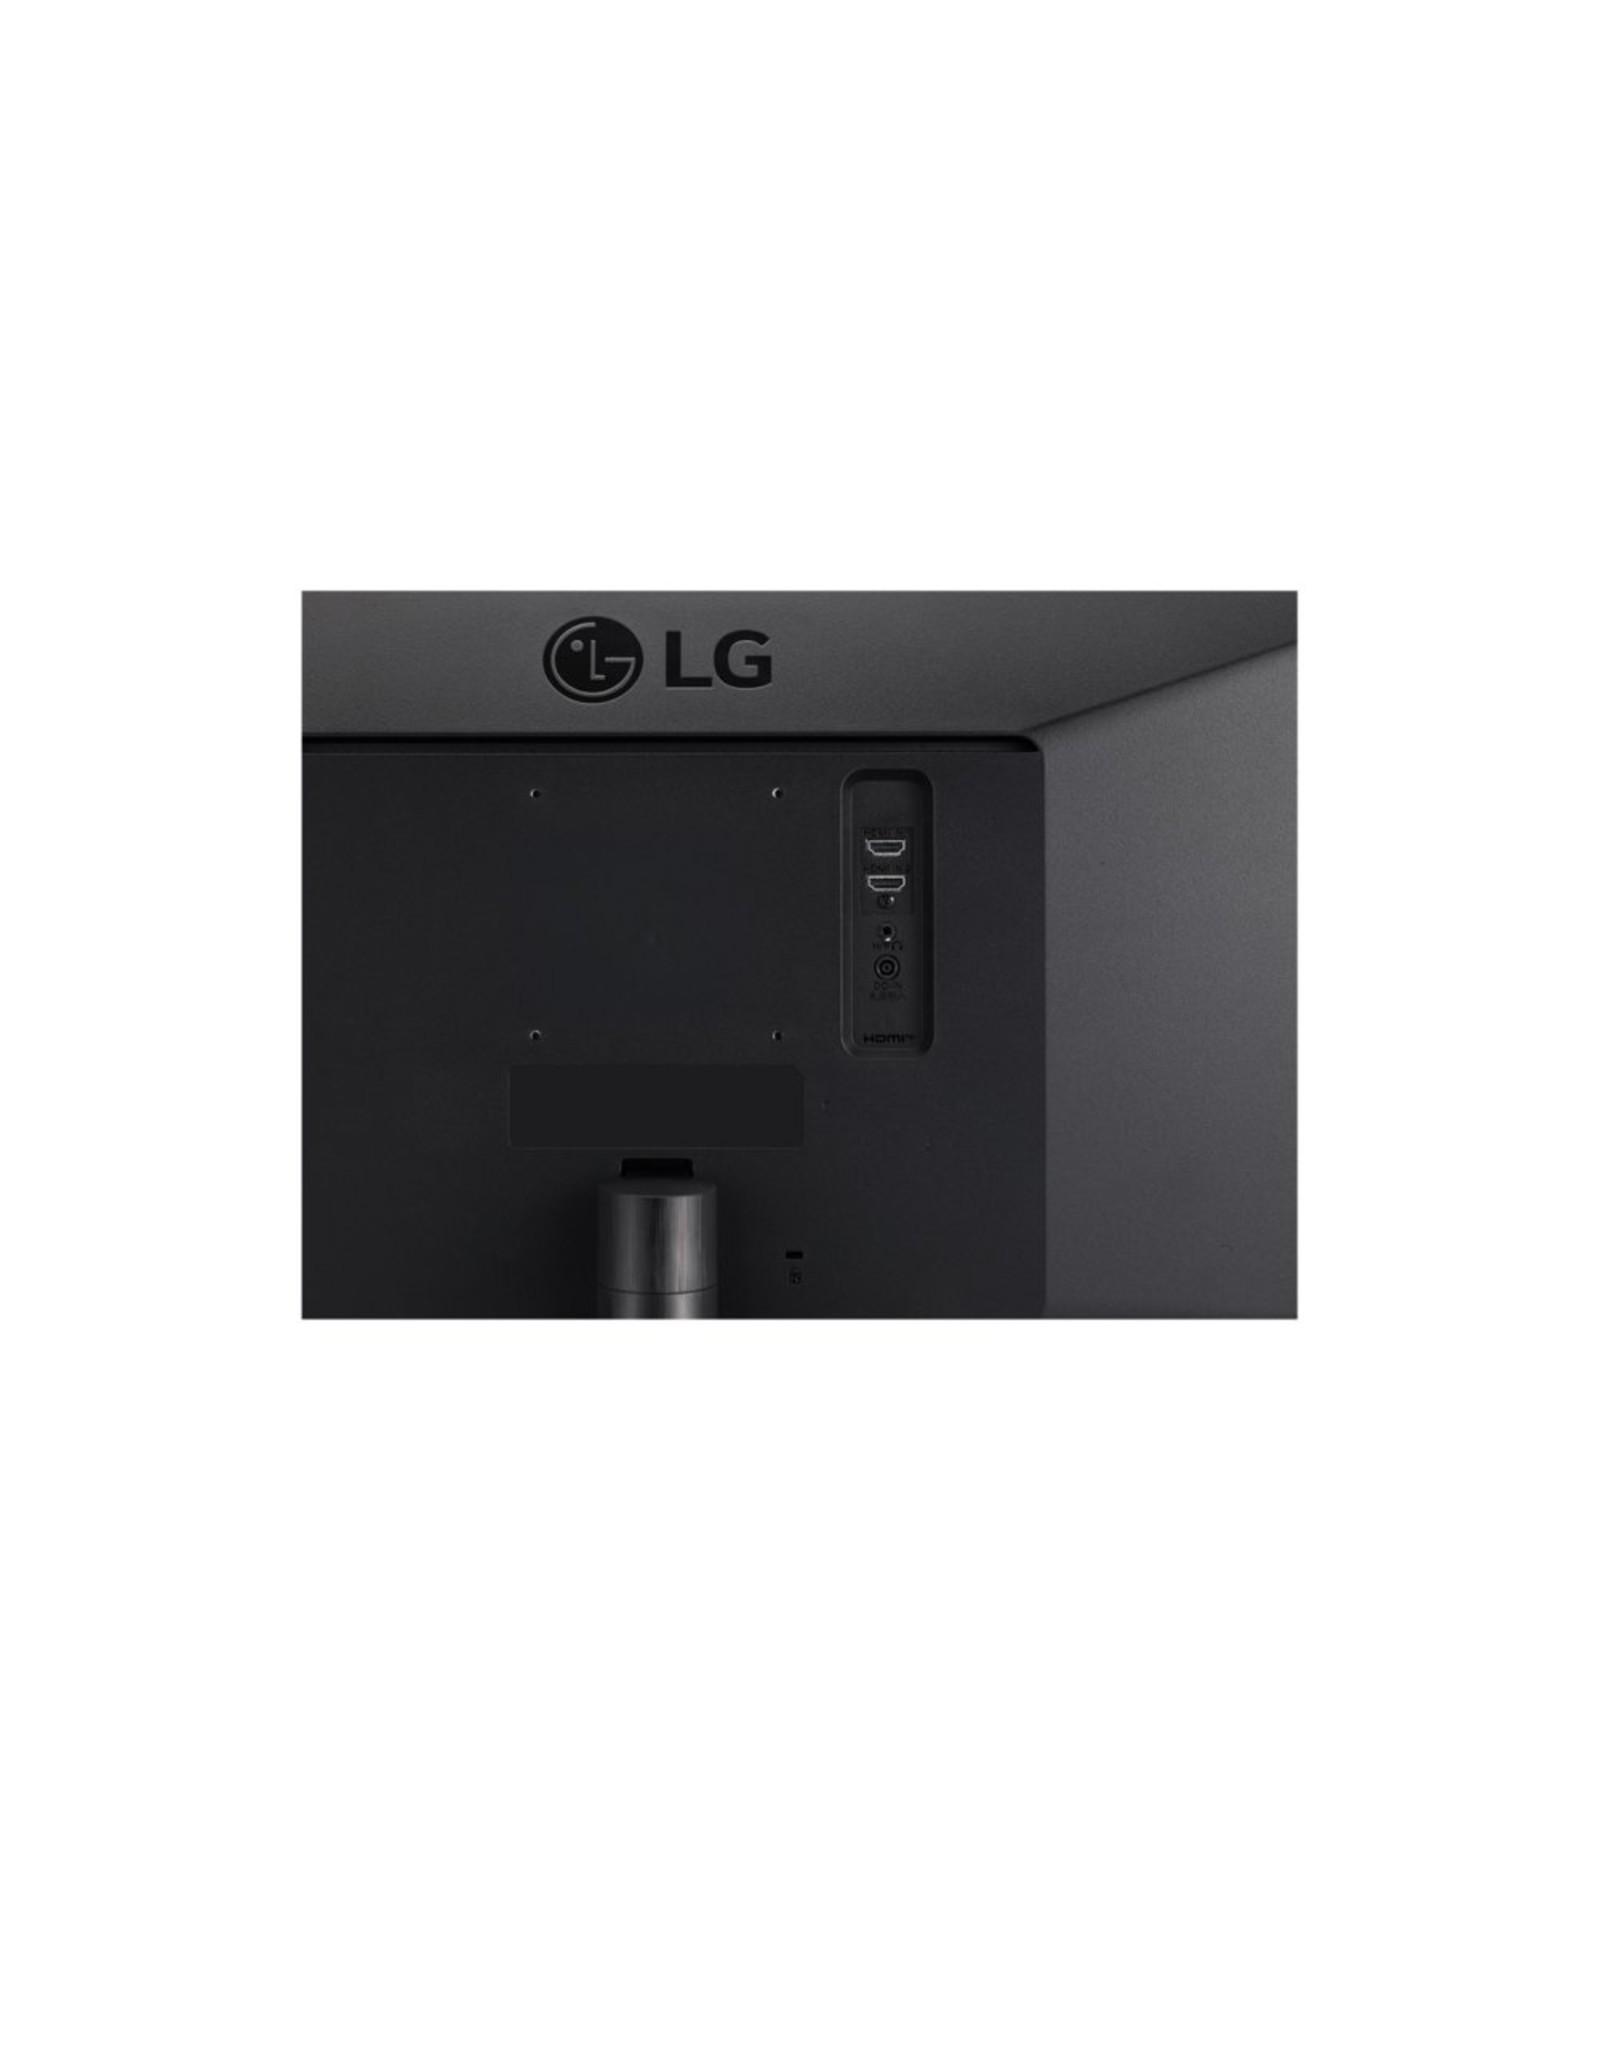 LG Mon  29WP500-B 29inch UltraWide / IPS / 2 x HDMI / 75Hz